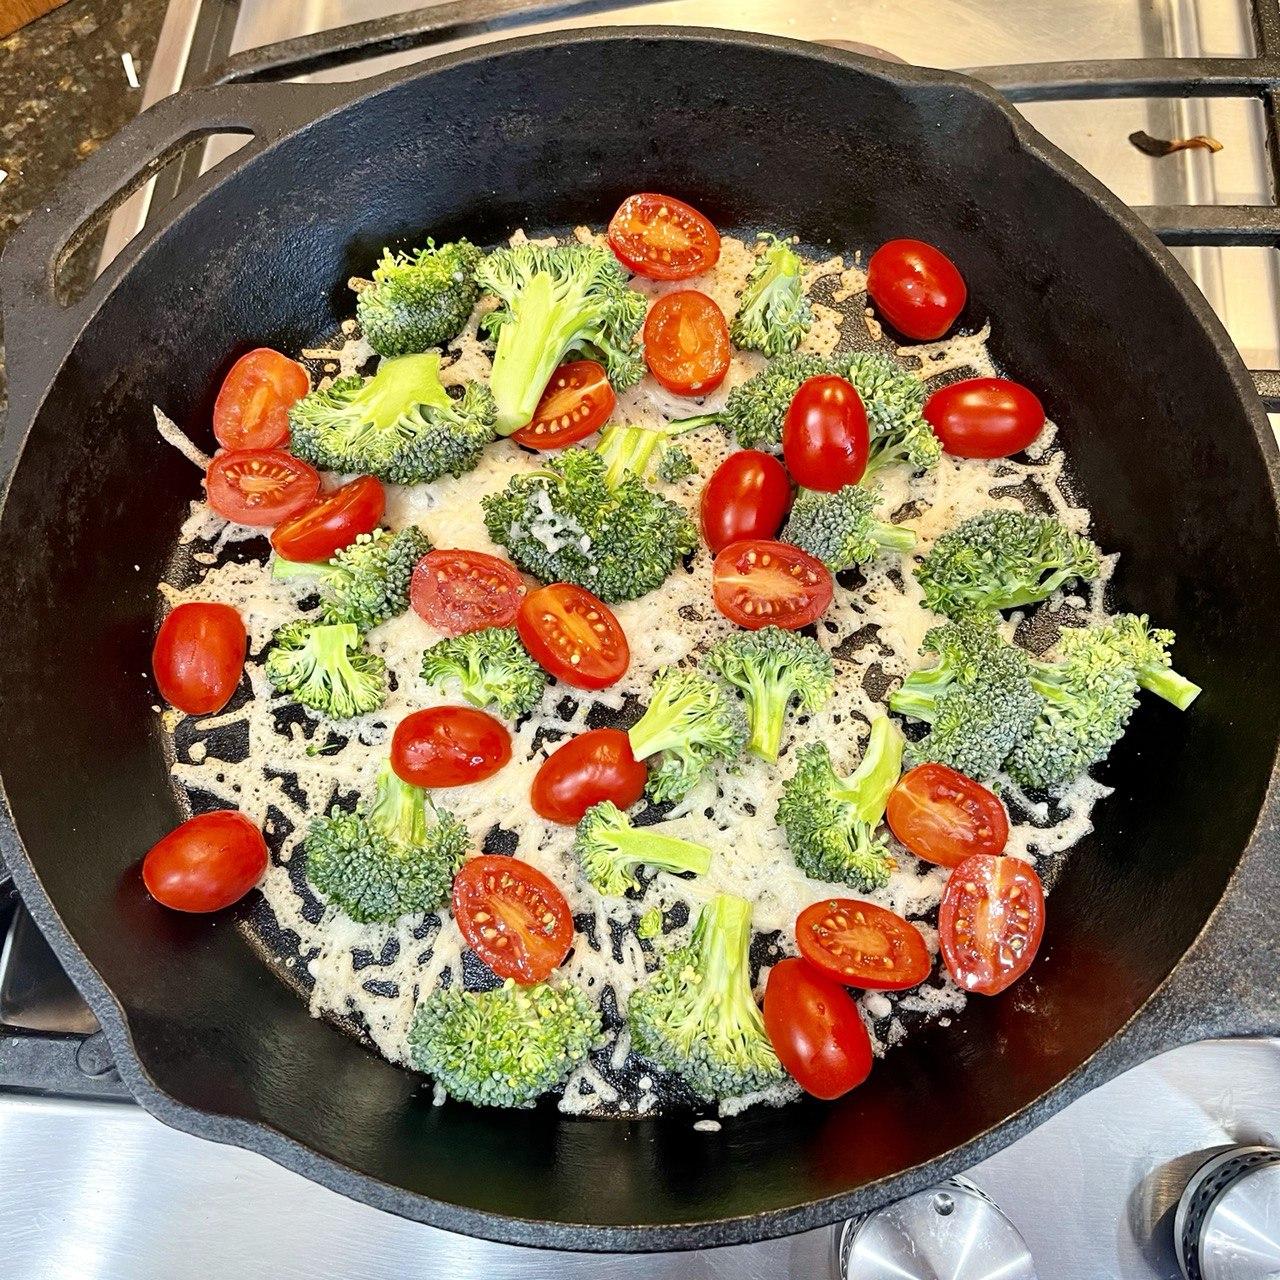 close-up of vegan parmesan cheese under cherry tomato halves and broccoli floret halves